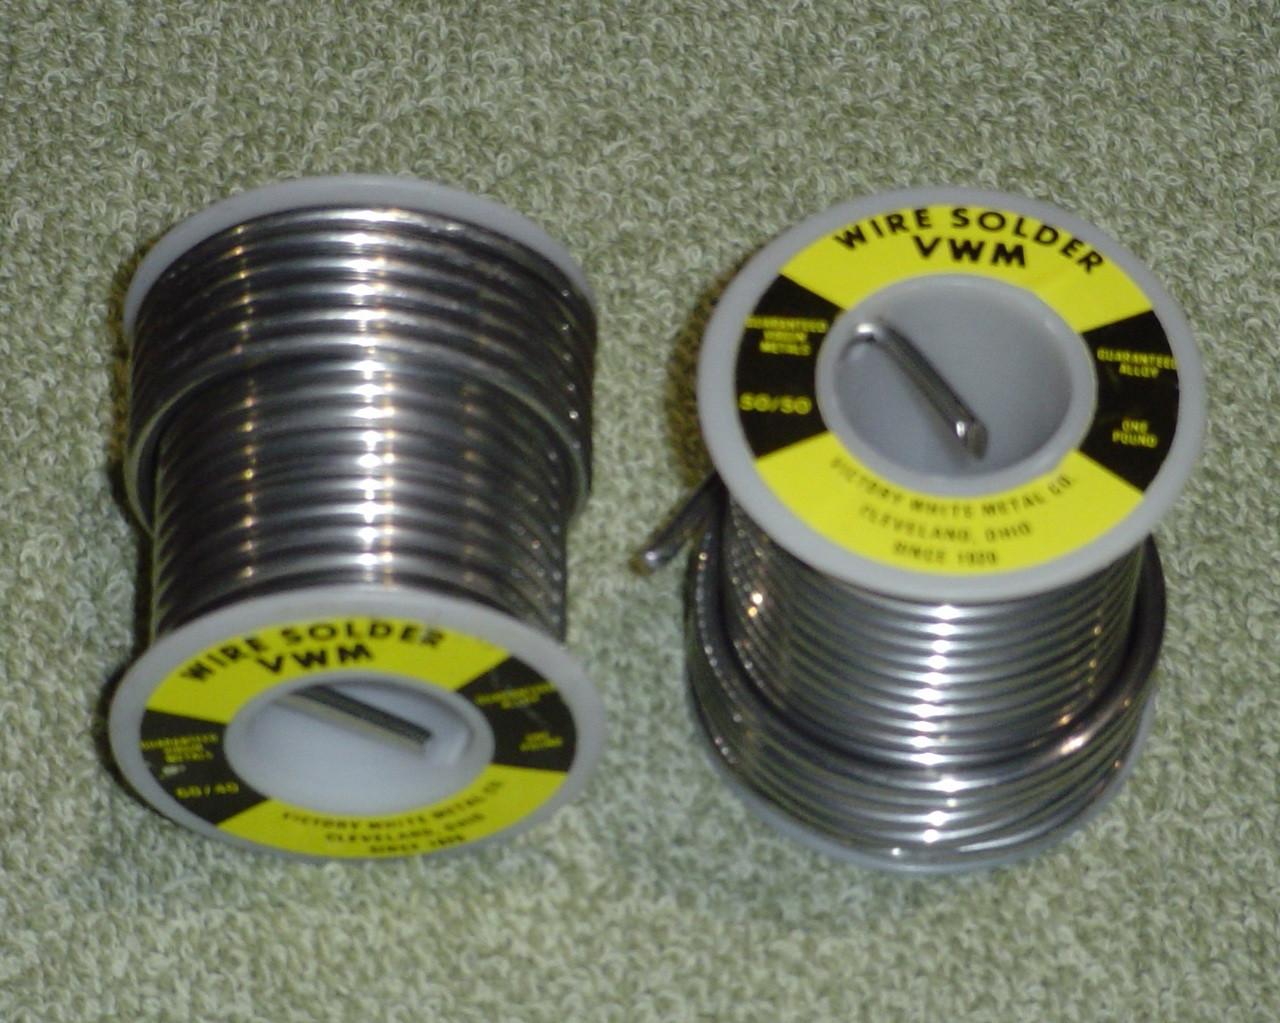 50/50 Wire Solder 1 lb Spool Free Shipping 50 LB Box